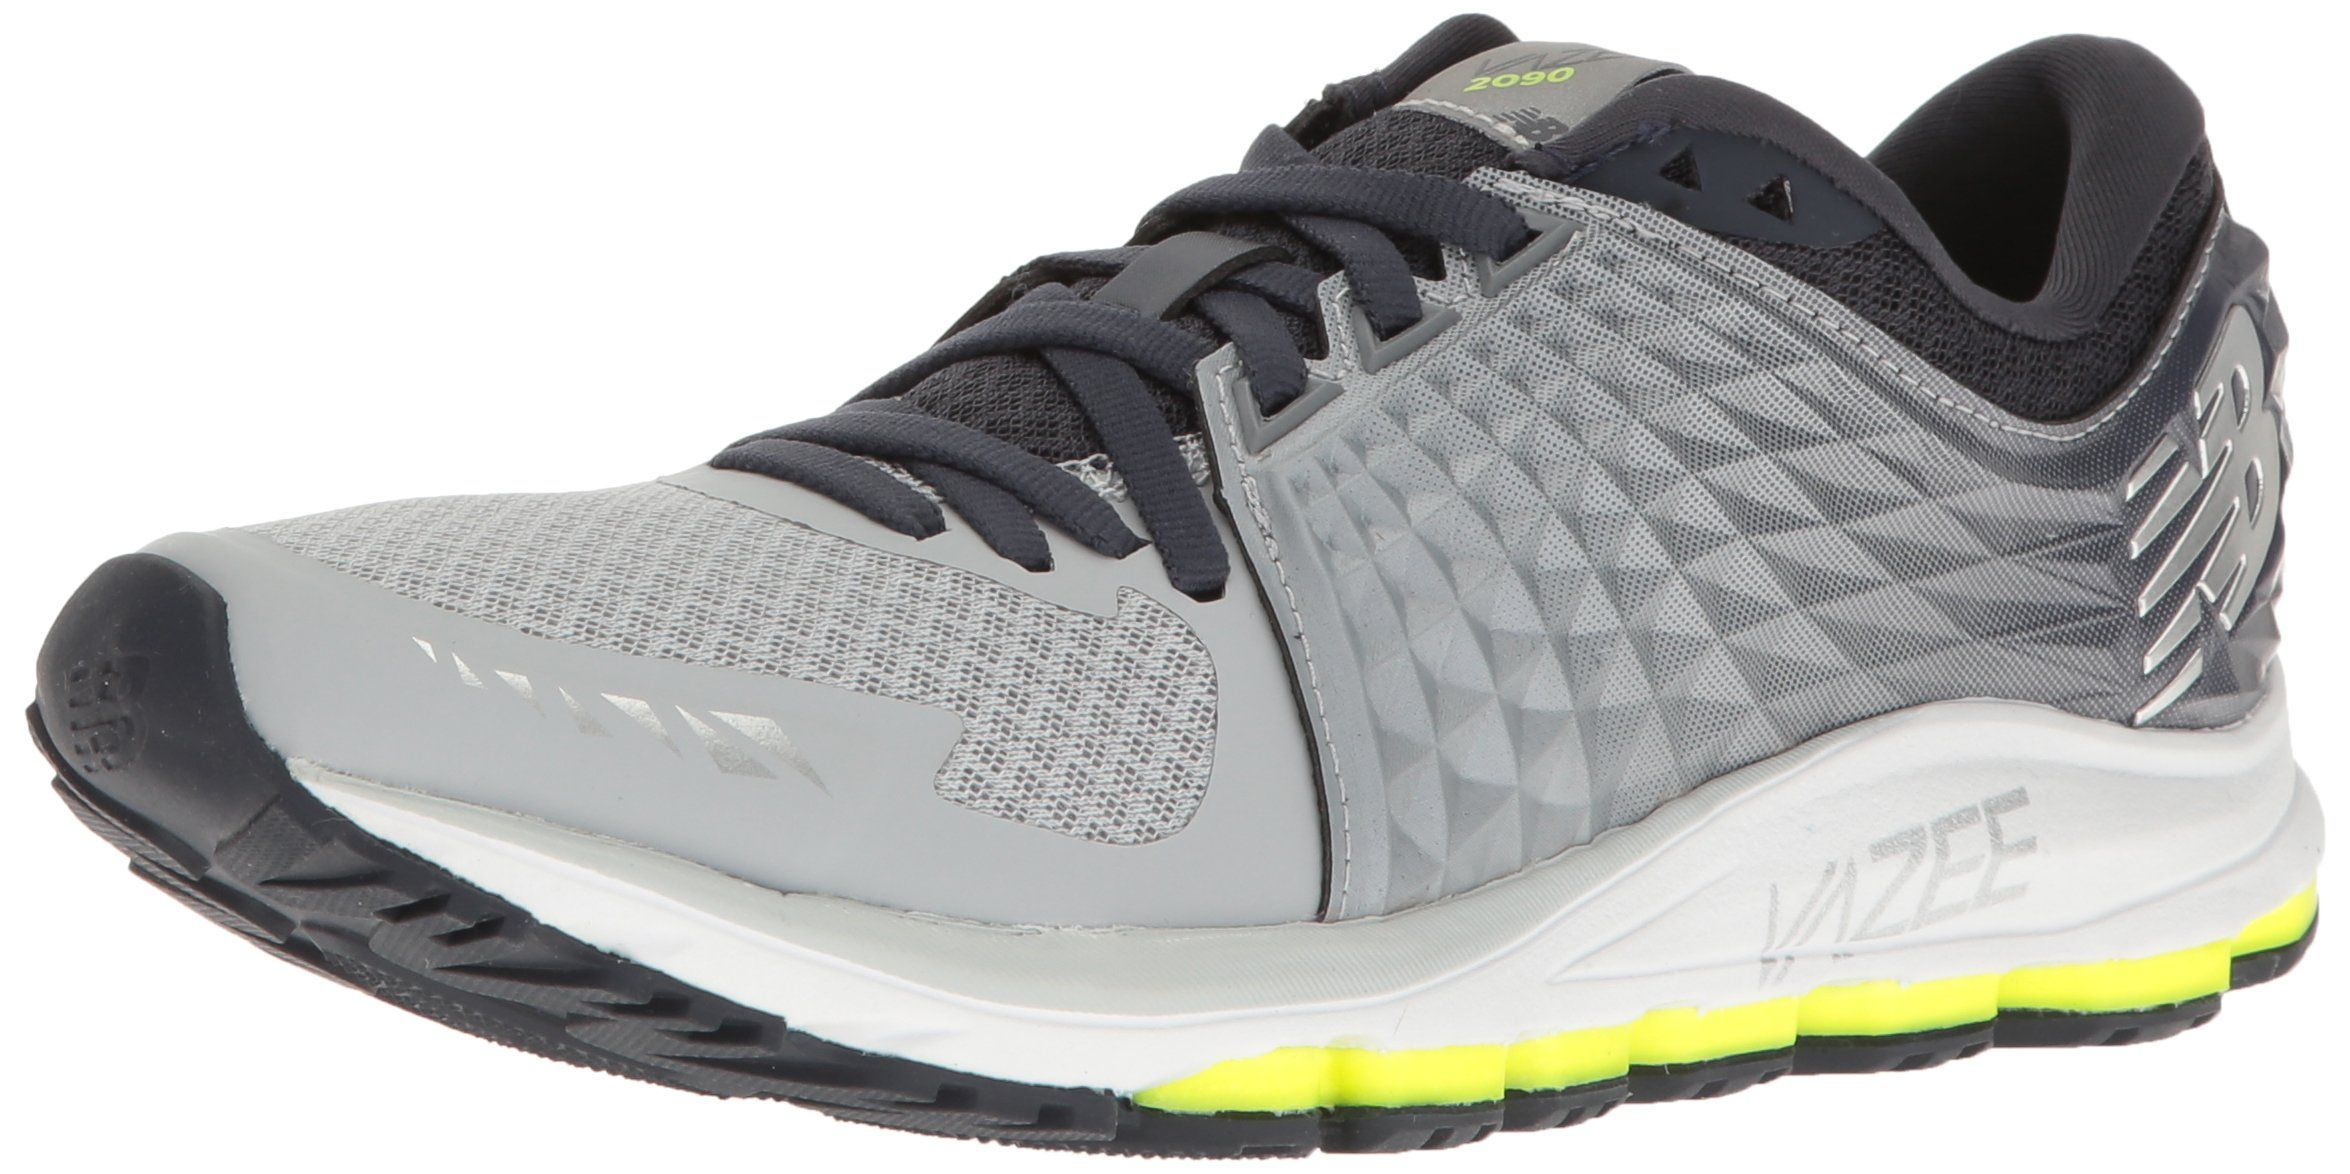 Balance Womens W2090V1 Runningshoe Running Shoe Silver Mink/Outerspace 7.5 B U